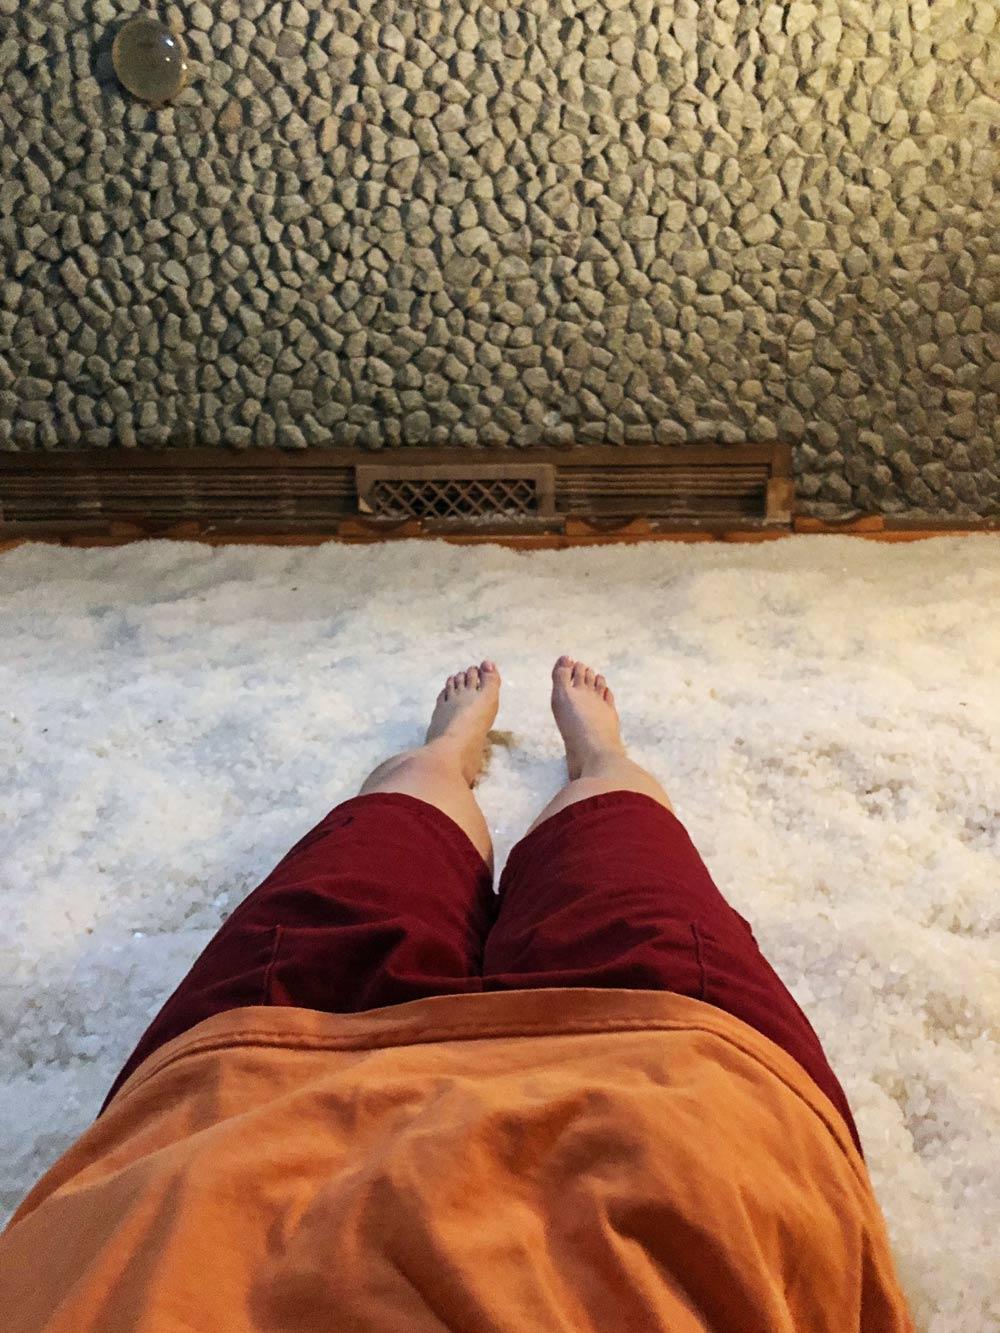 Jimjilbang Near Me : jimjilbang, Guide, Korean, Sauna, (Jjimjilbang), Experience, Seoul, Things